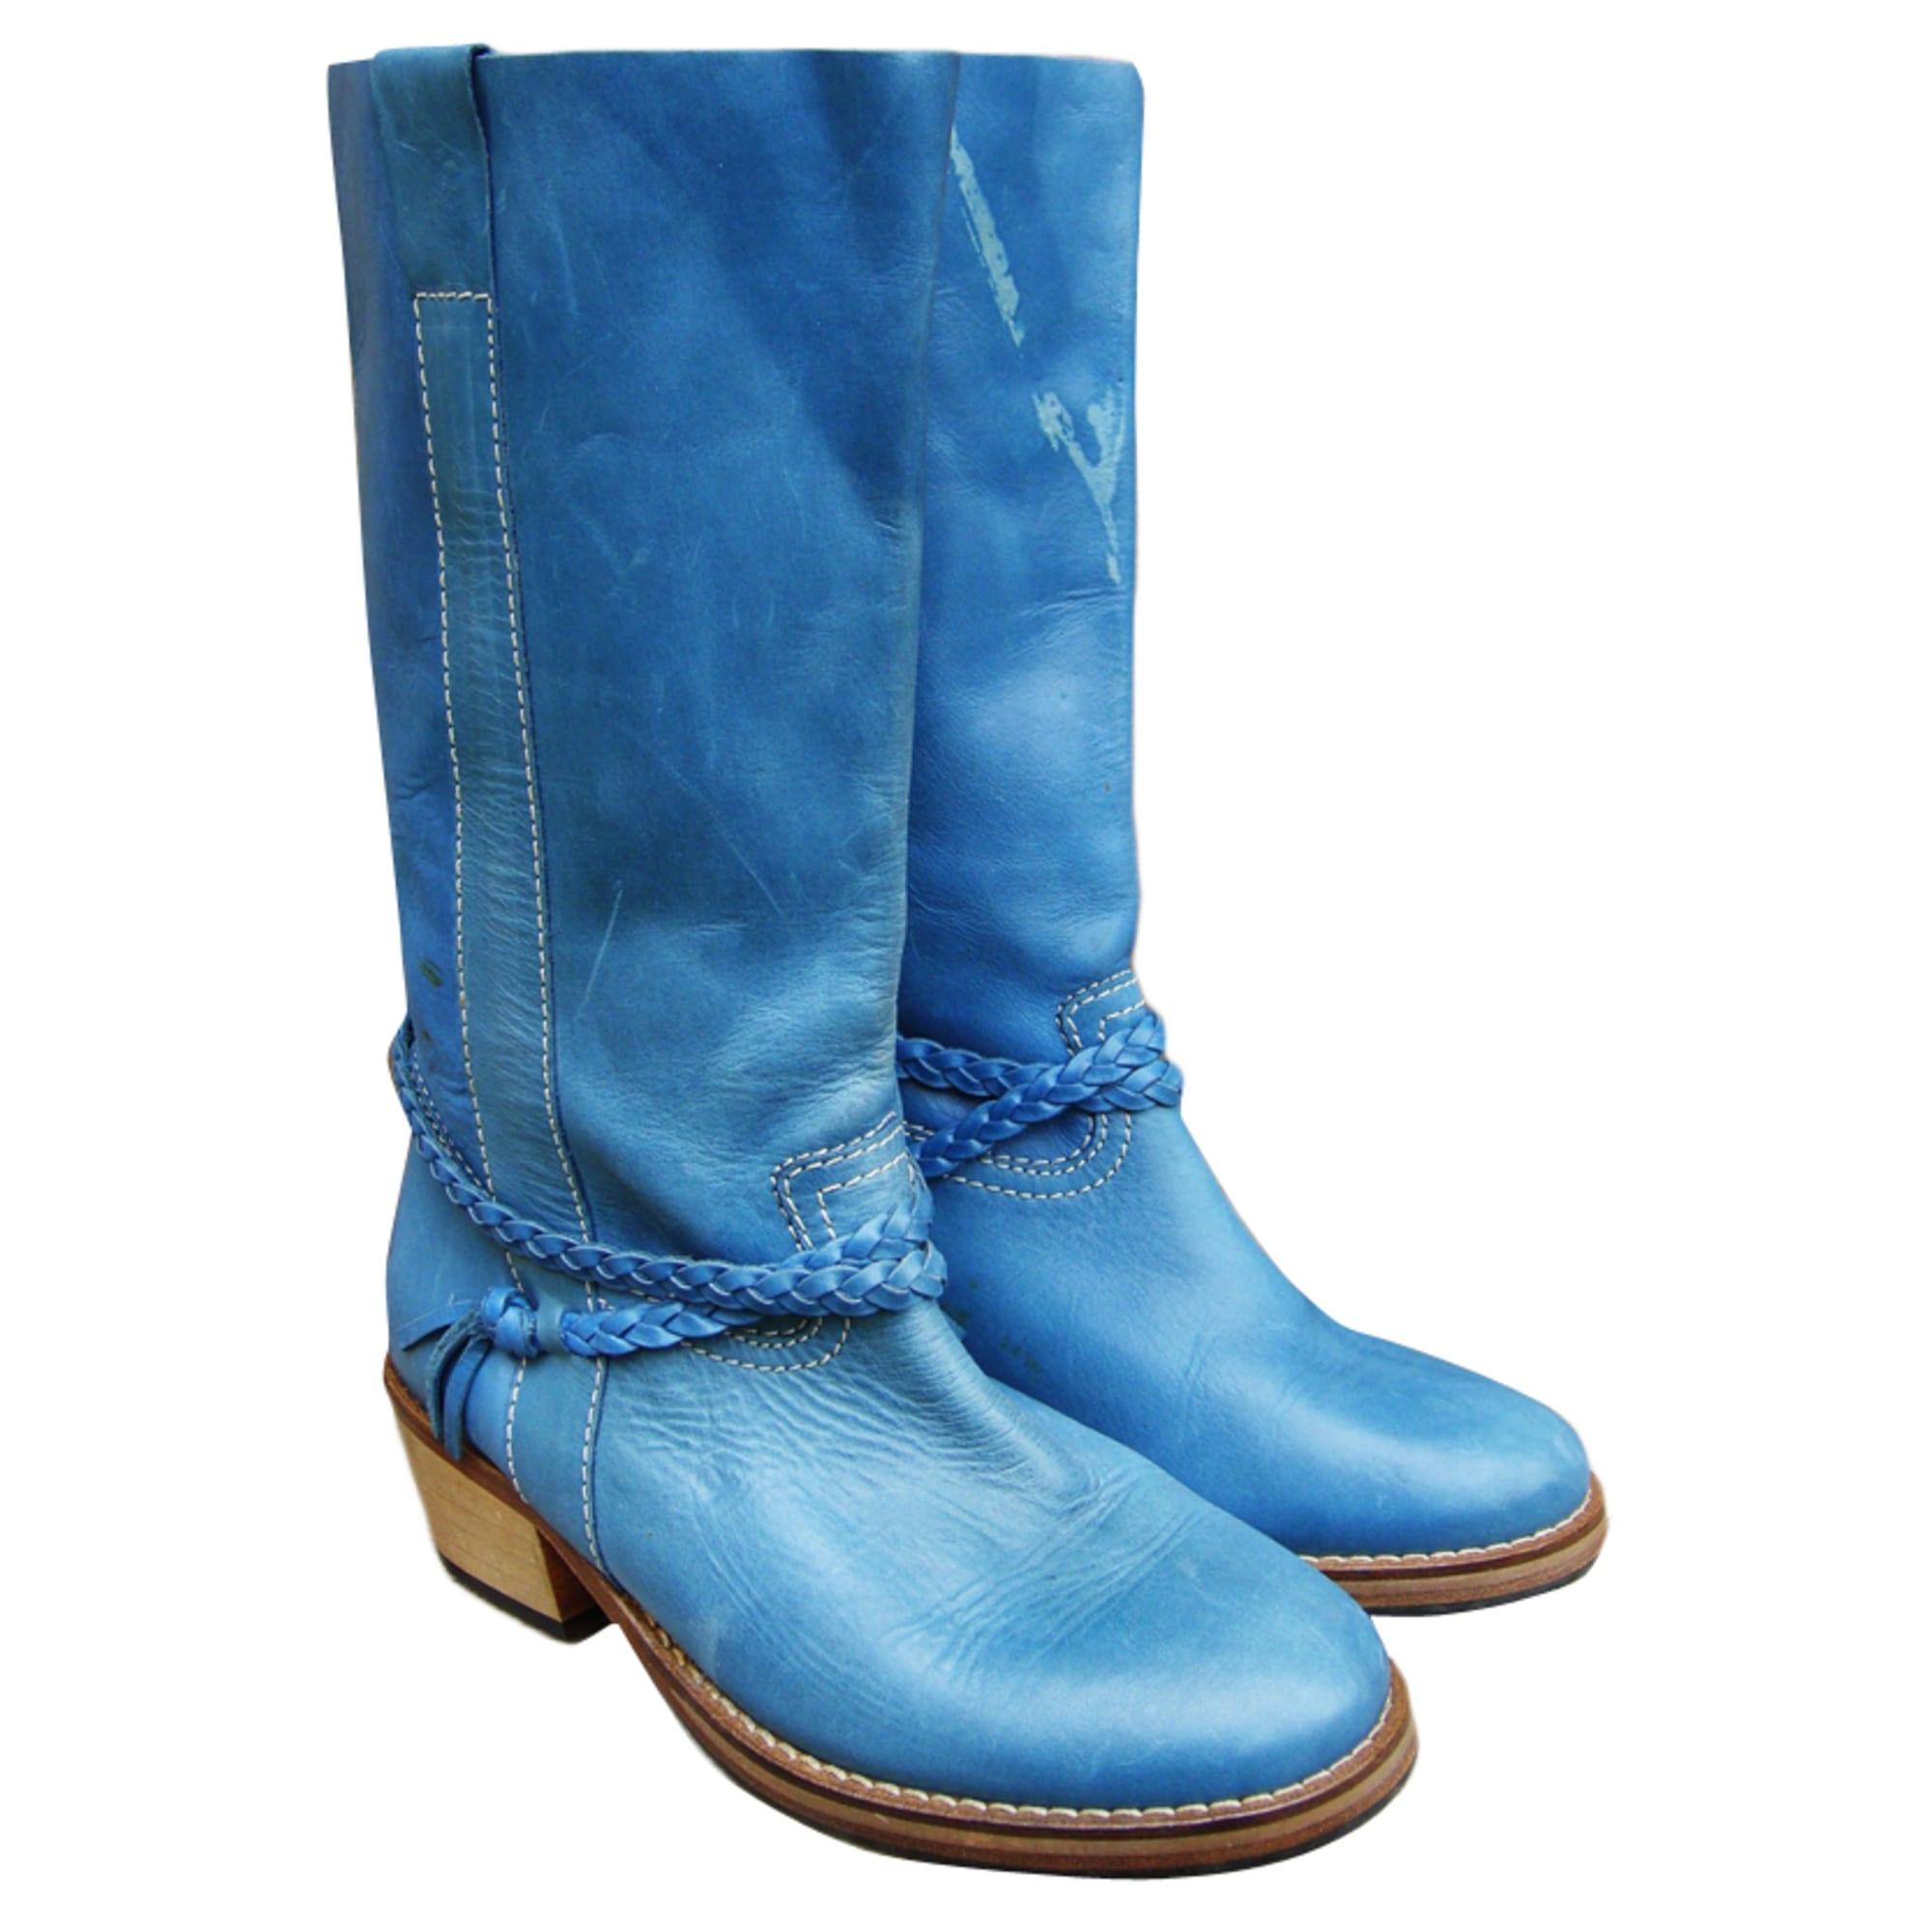 Bottes plates SESSUN Bleu, bleu marine, bleu turquoise